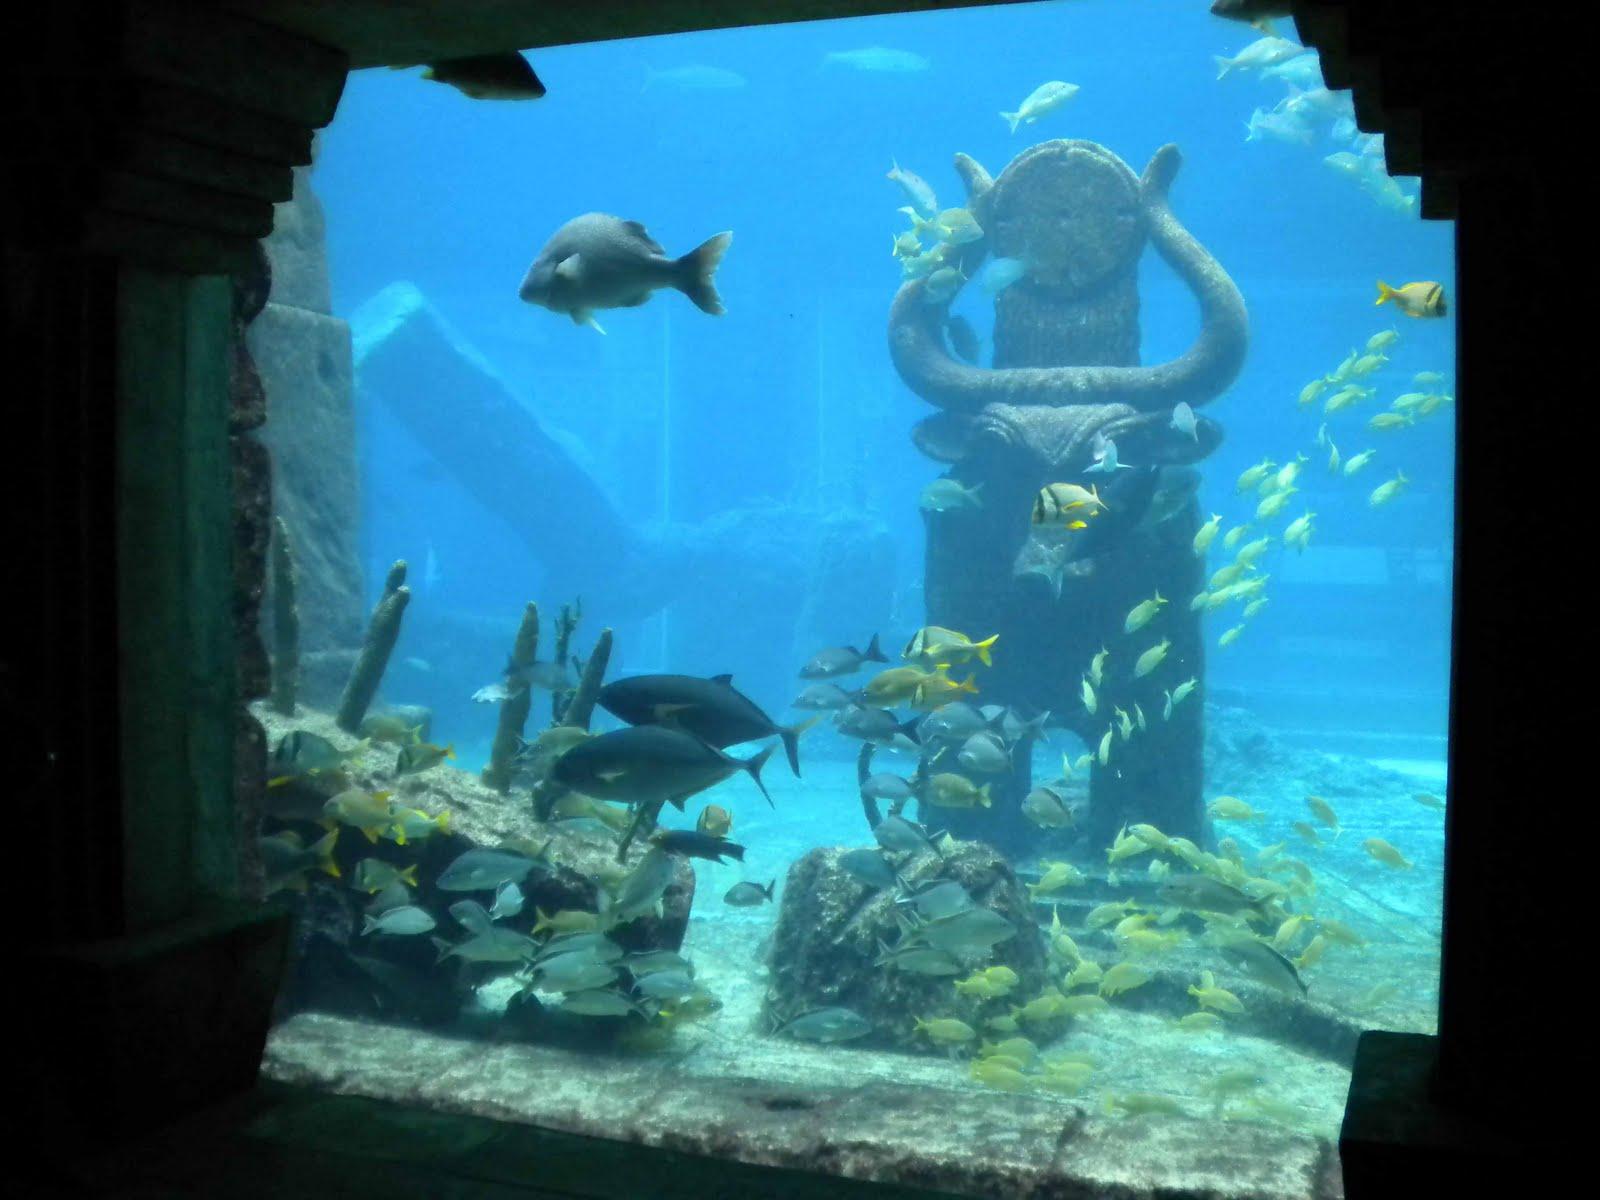 Adventuresome 50 By 50 The Atlantis Resort Paradise